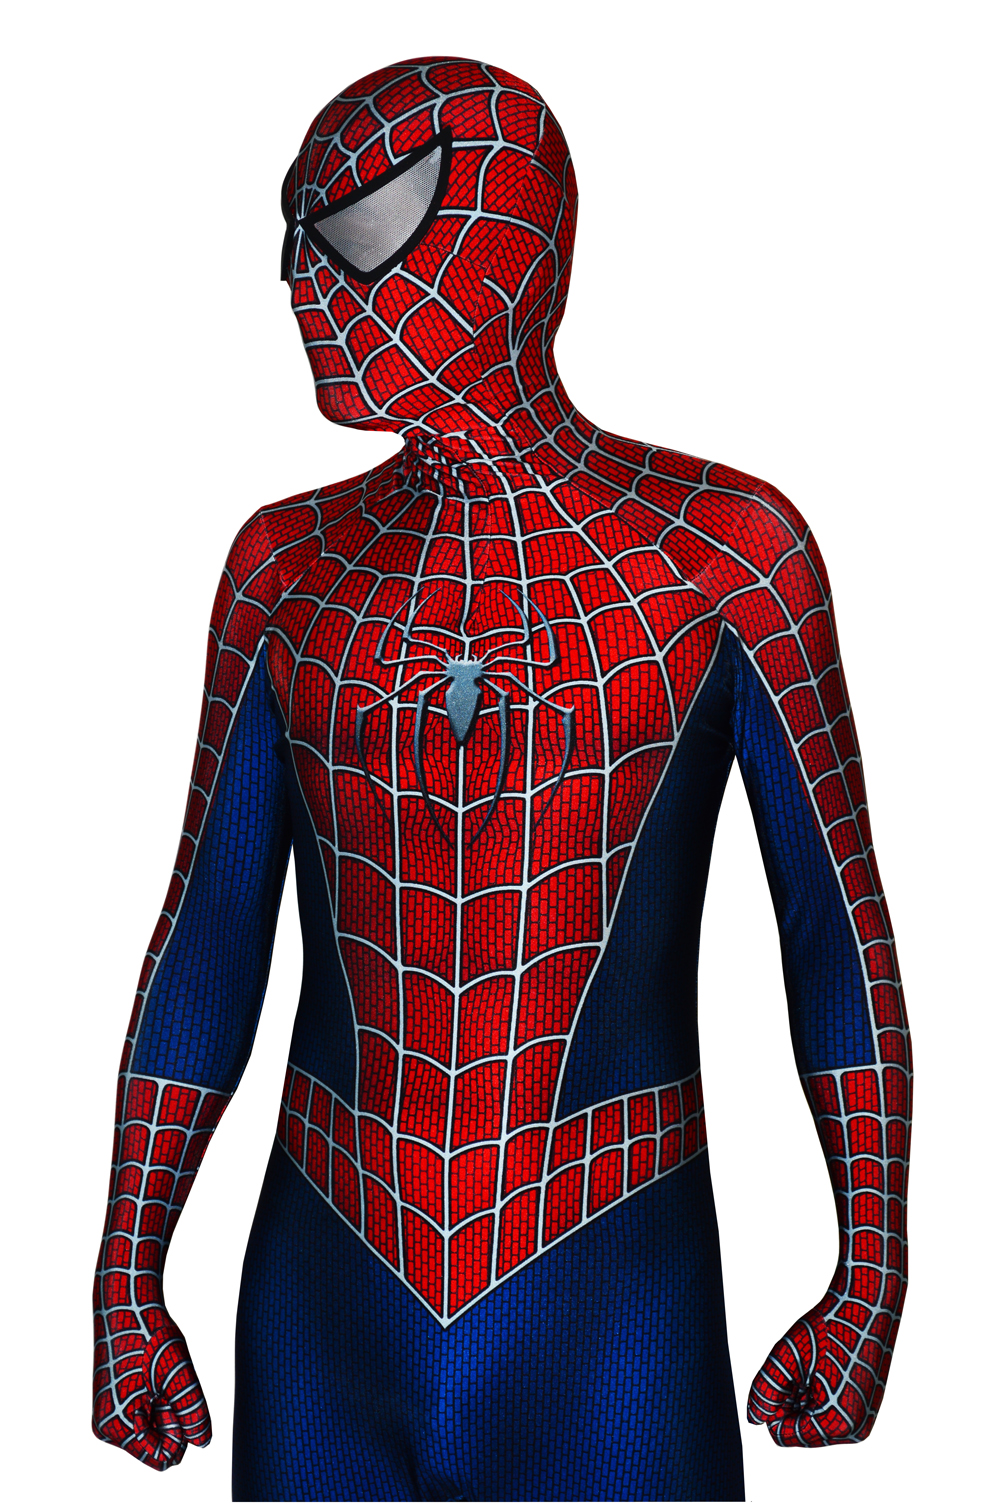 2019 Spiderman Raimi Costume 3D Print Halloween Zentai Suit Spiderman Cosplay Bodysuit Free Shipping